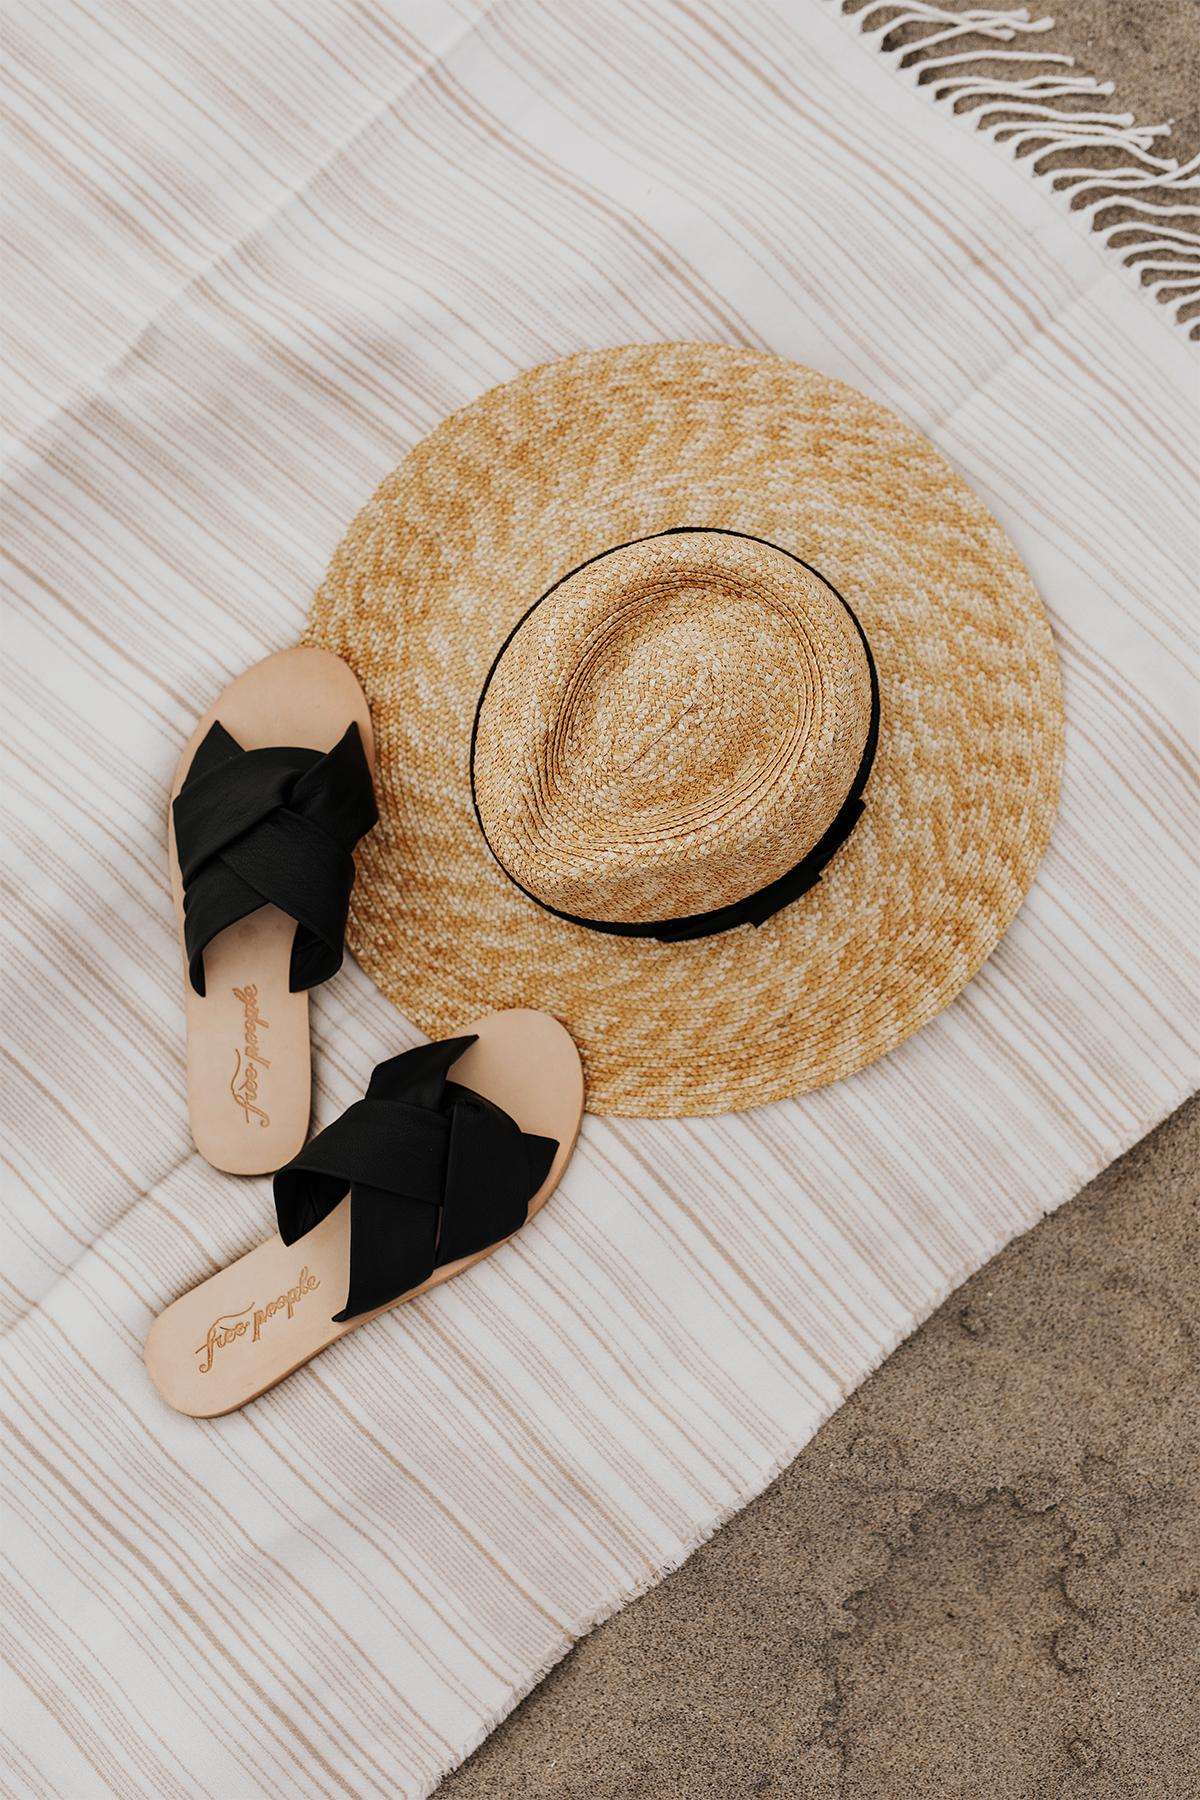 Brixton Straw Hat Free People Black Sandals Beach Blanket